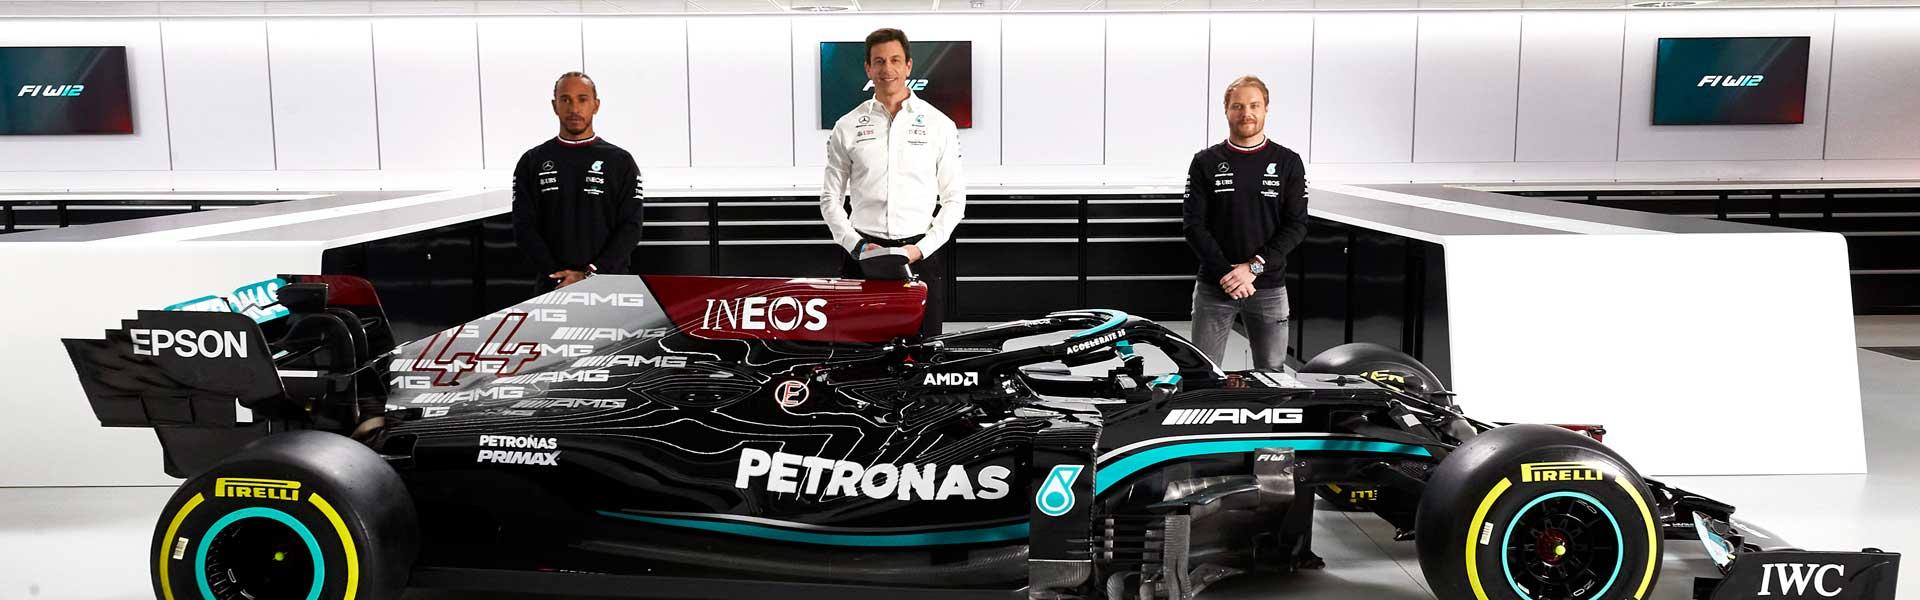 Watch Mercedes' 2021 car launch!